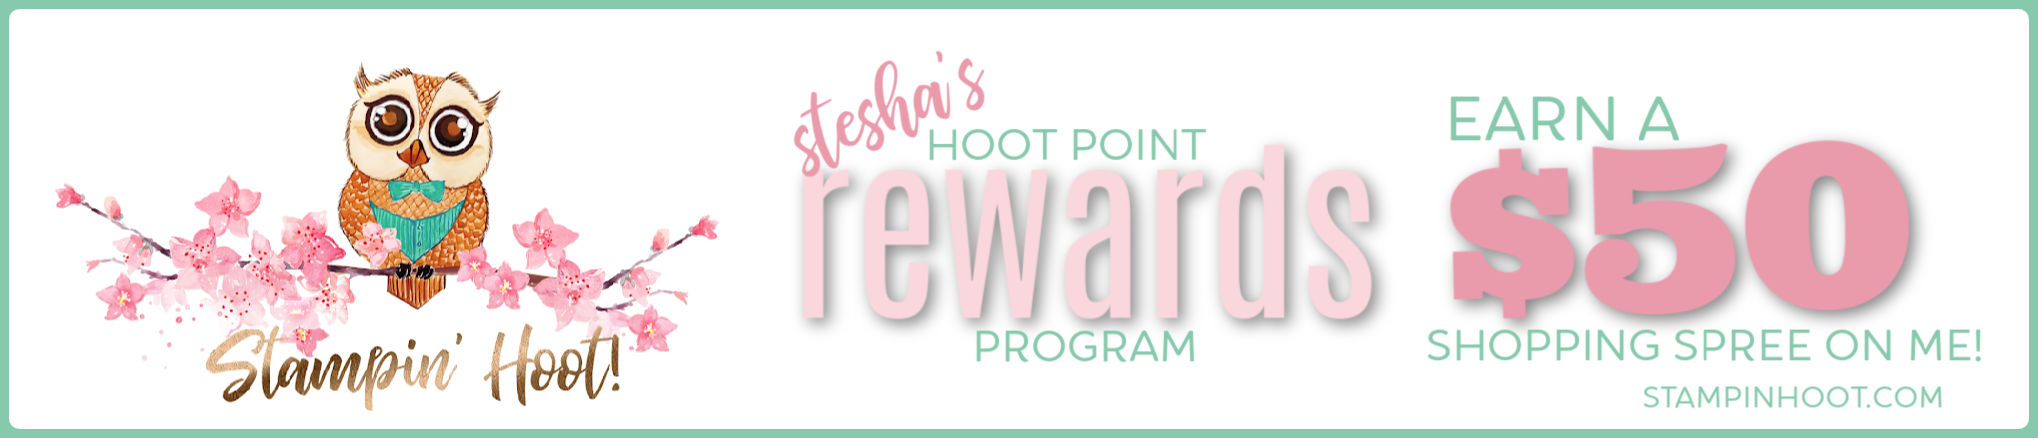 Hoot Point Rewards Program